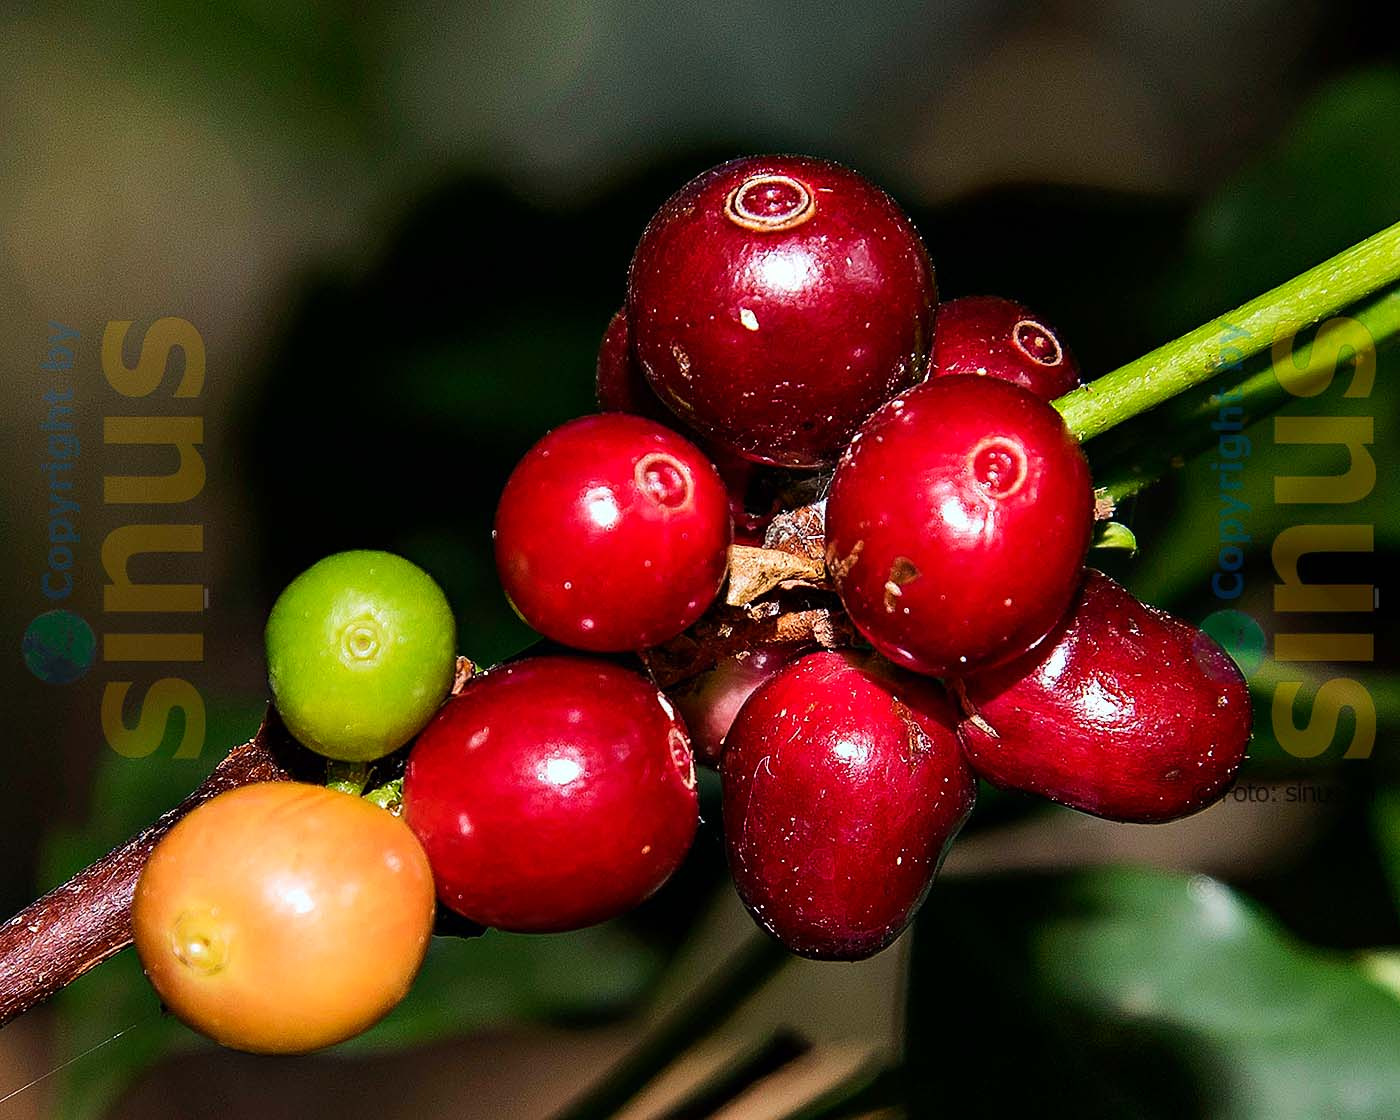 Die Kaffeefrucht umhüllt den Kern der Kaffeekirsche